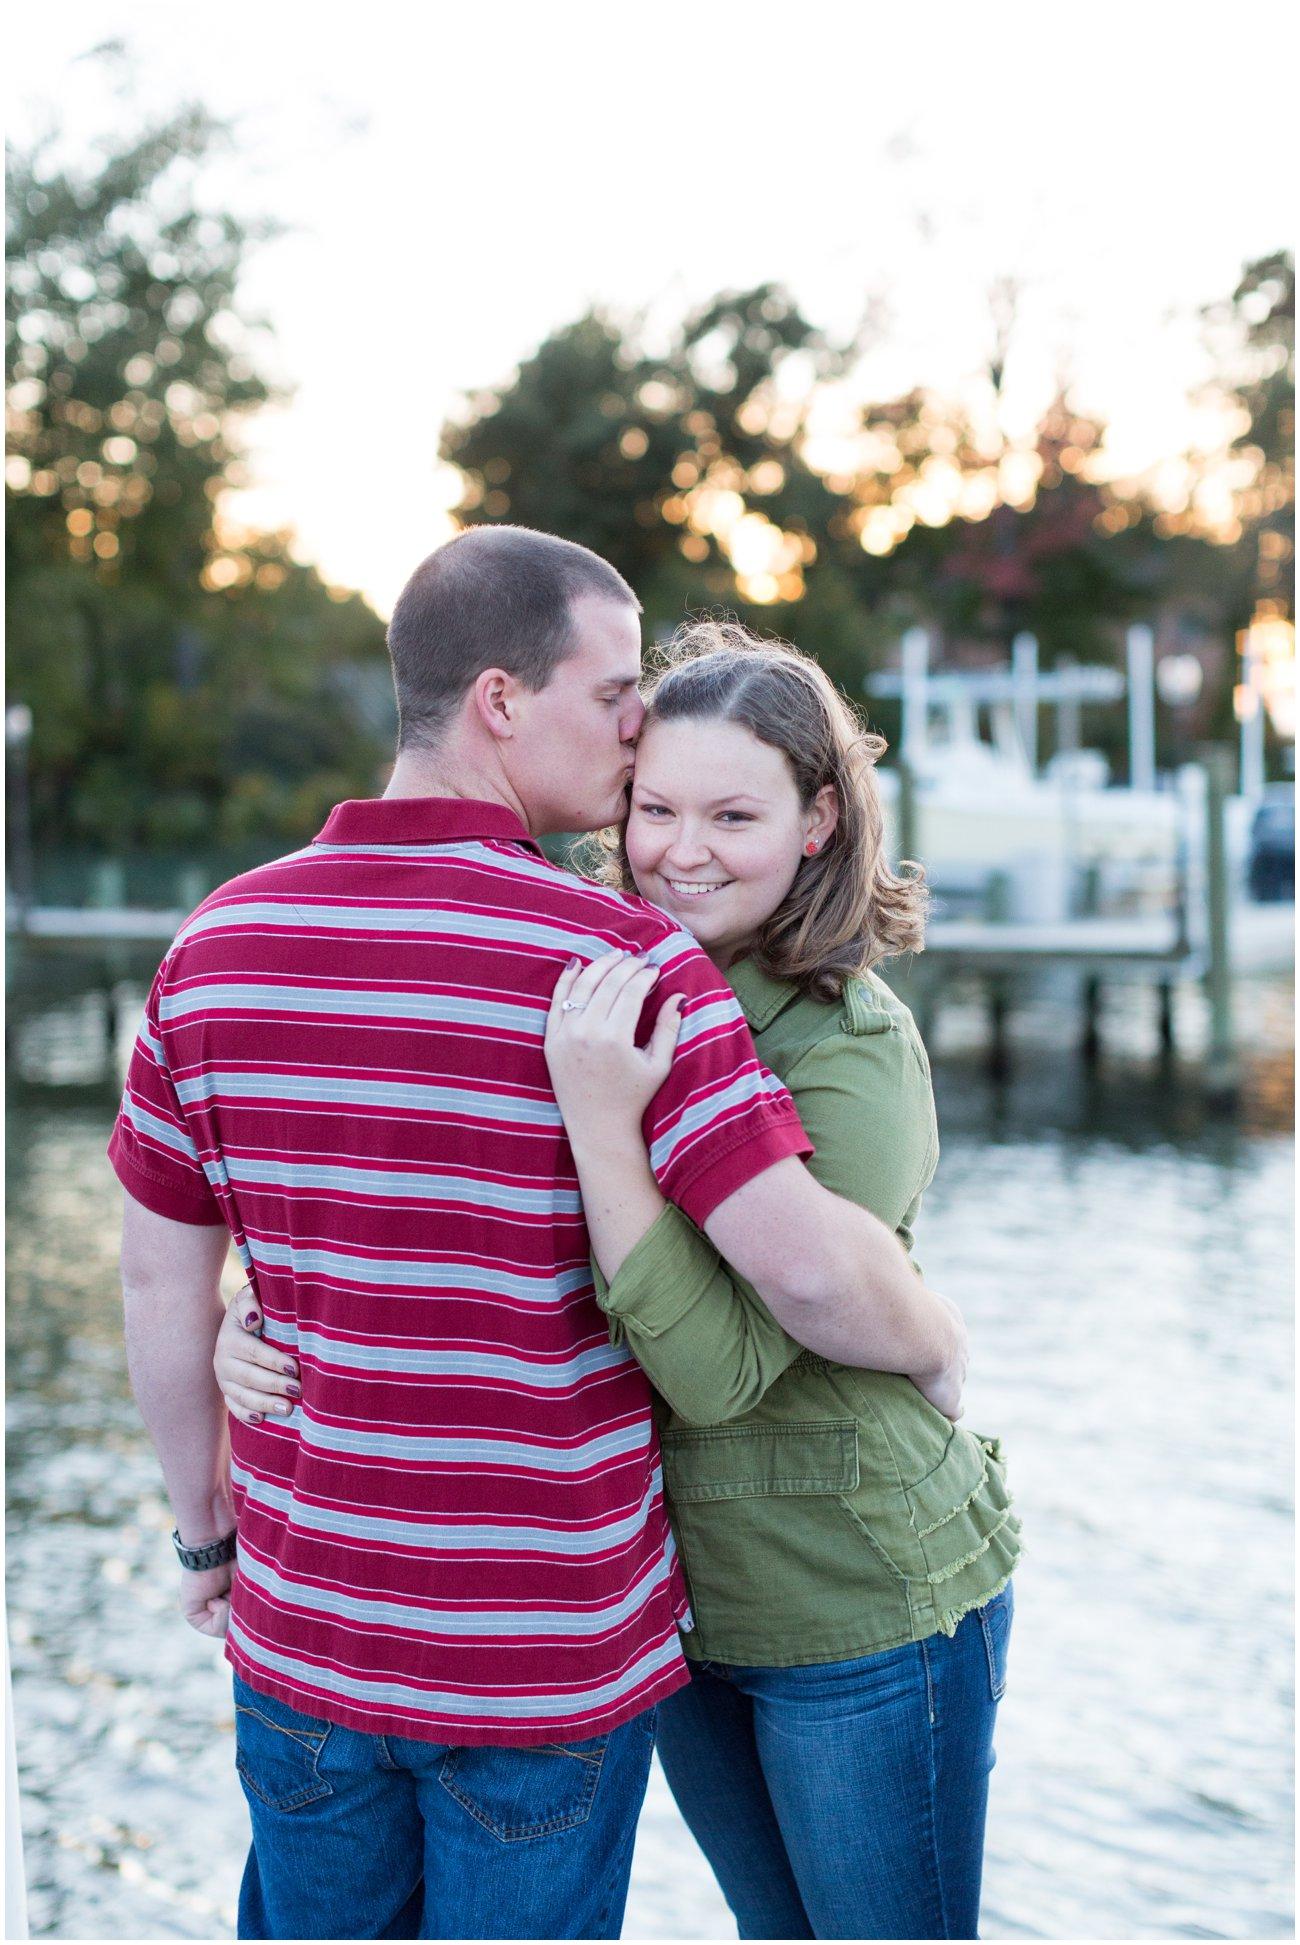 Sarah_Jacob_Annapolis_Engagement_0003